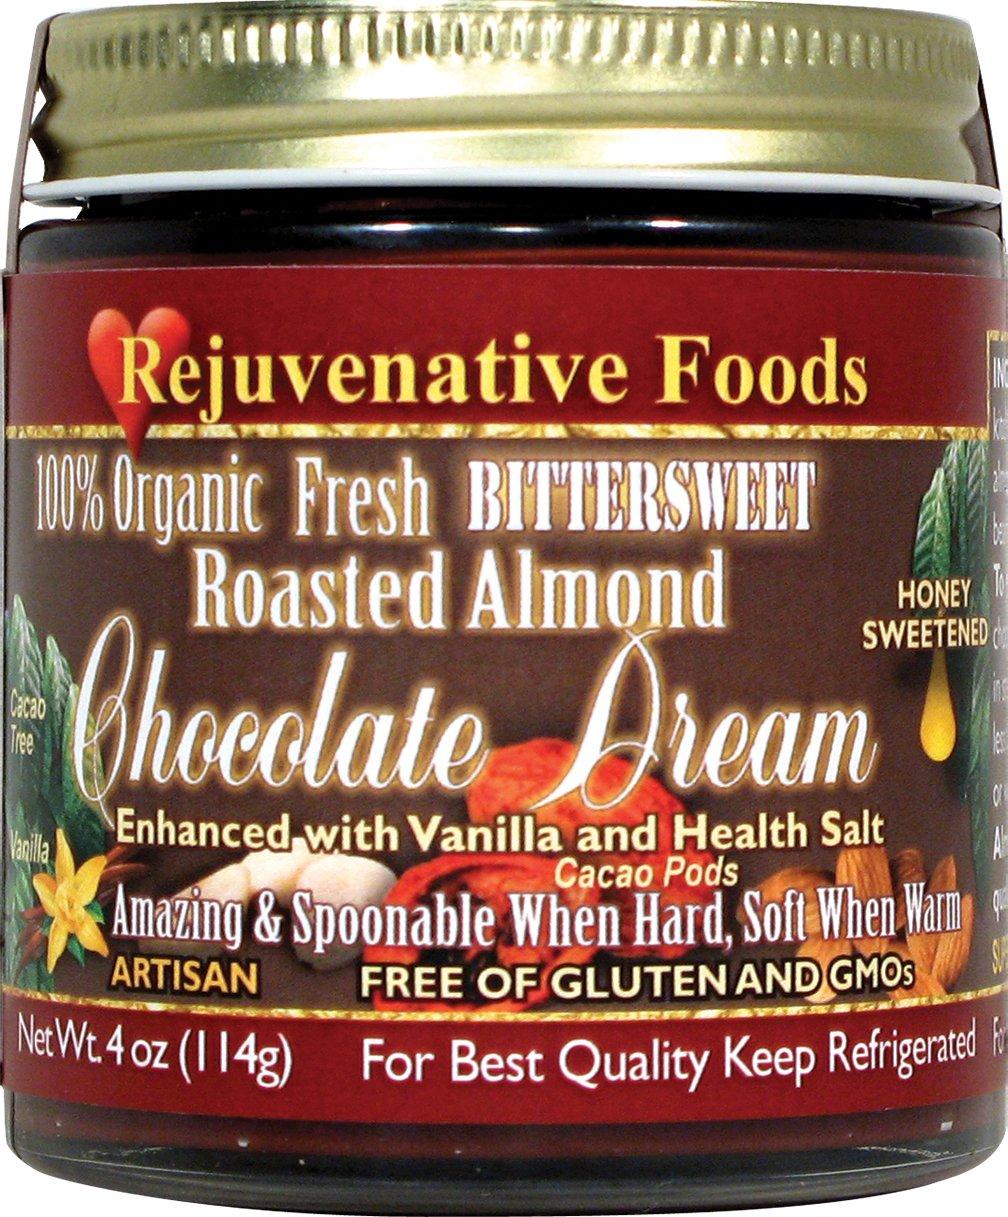 Vanilla Honey Roasted Almond Bittersweet Chocolate Smooth-Dream Pure Fresh Dairy-Free StoneGround 100%-Certified-USDA-Organic white-sugar-free Antioxidants fudge candy-in-glass Rejuvenative Foods-9oz